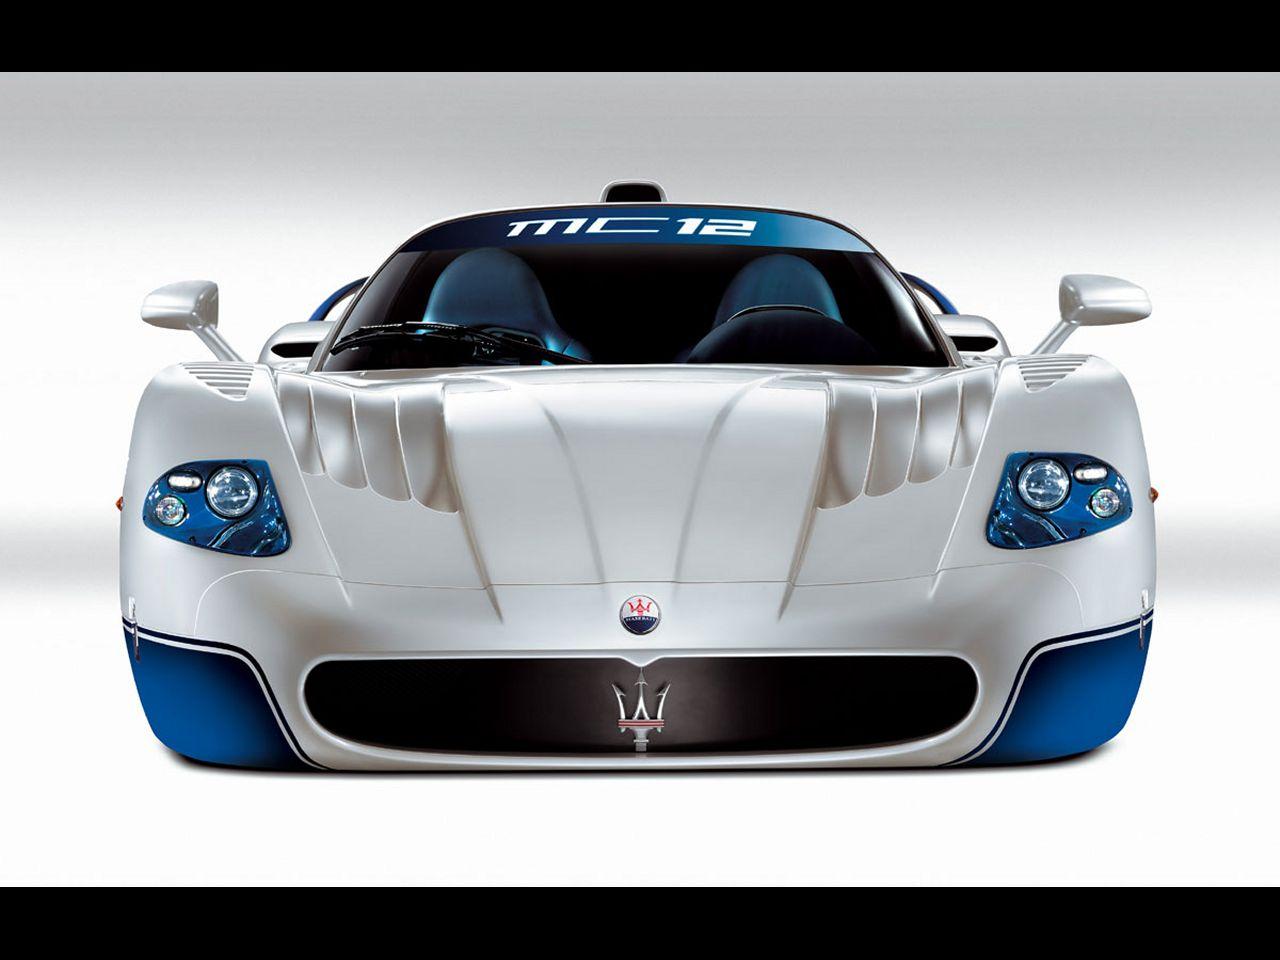 Wallpaper: 2005 Maserati MC12